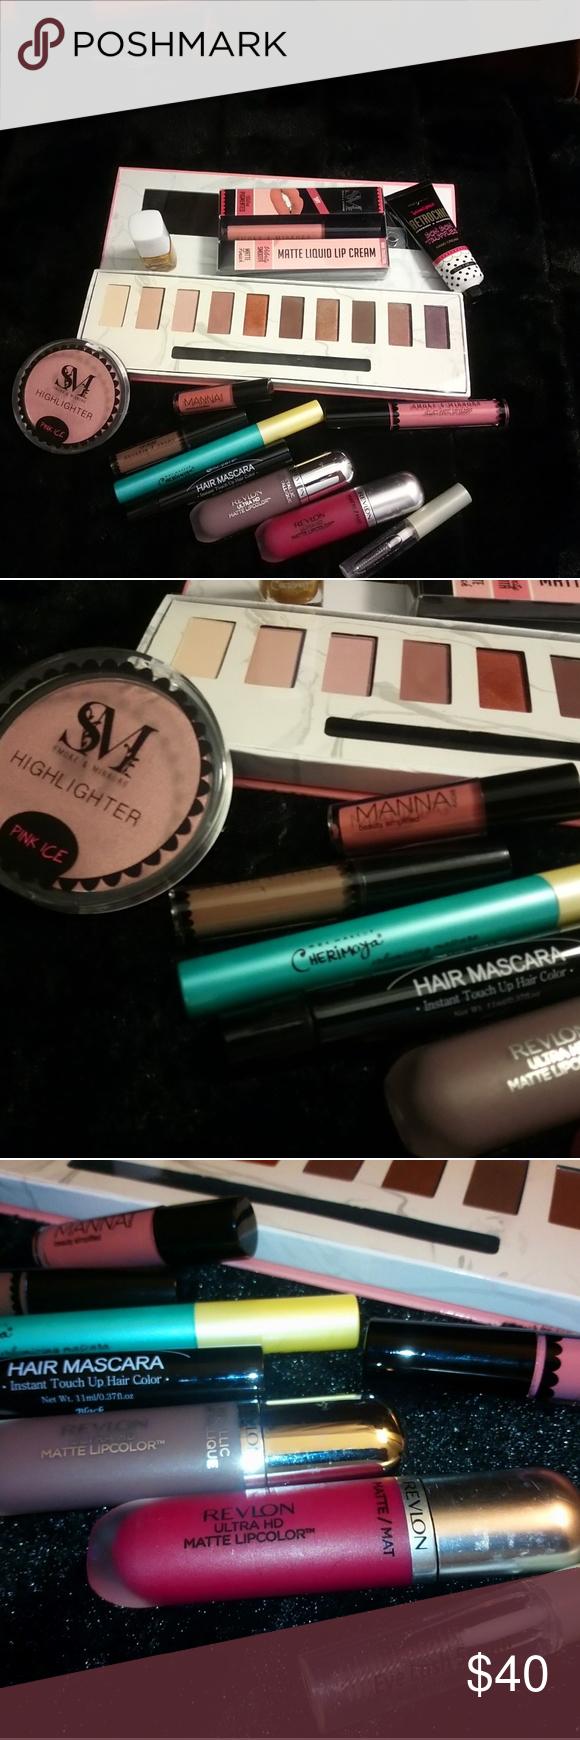 Grab bag makeup Has inside Manna kadar, cherimoya, Revlon